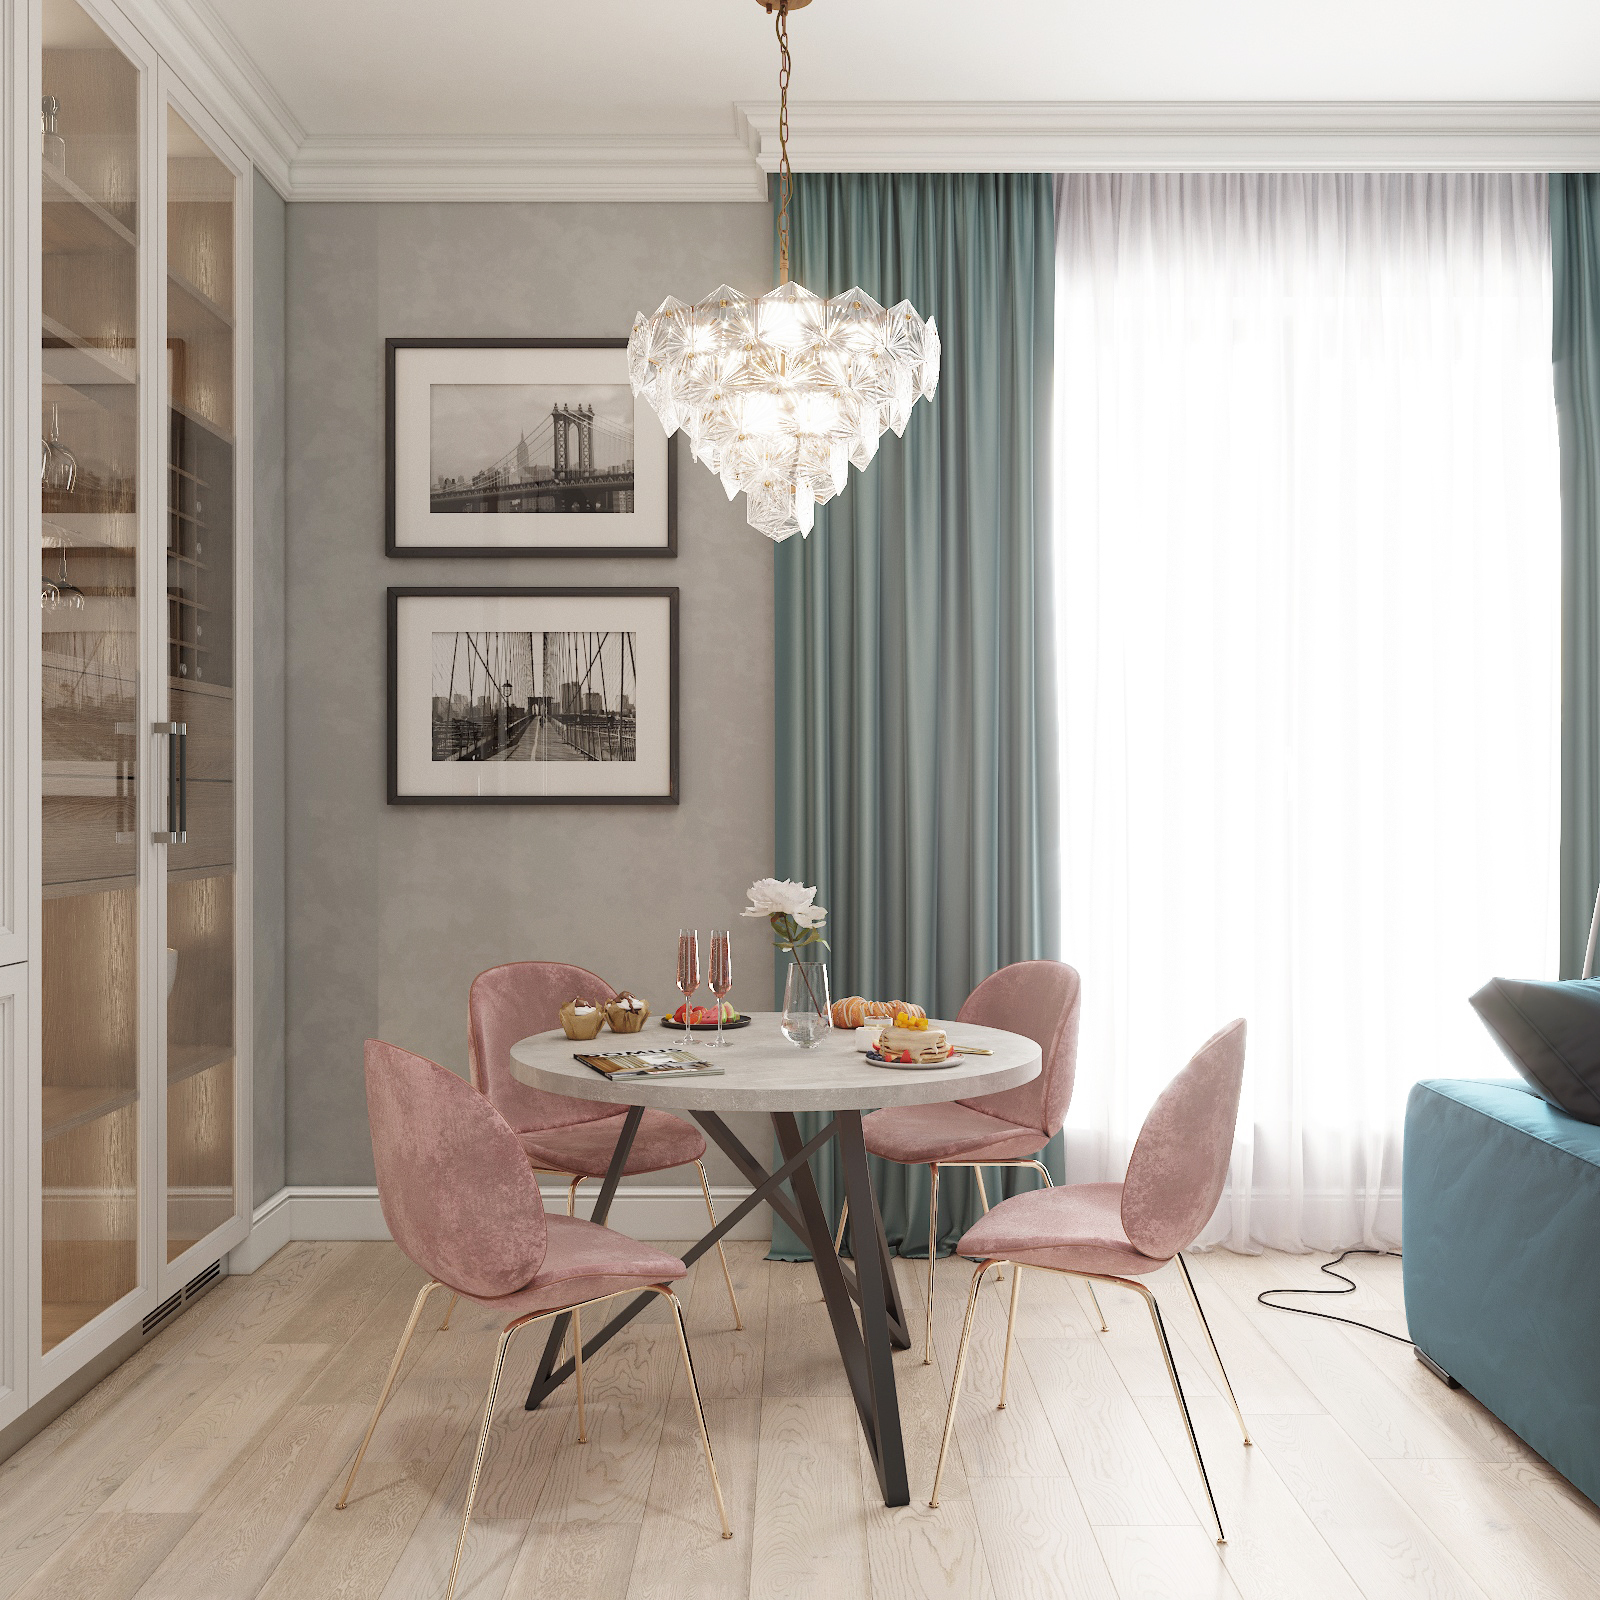 Обеденный стол ДОМУС Твист-1 бетон серый/металл черный